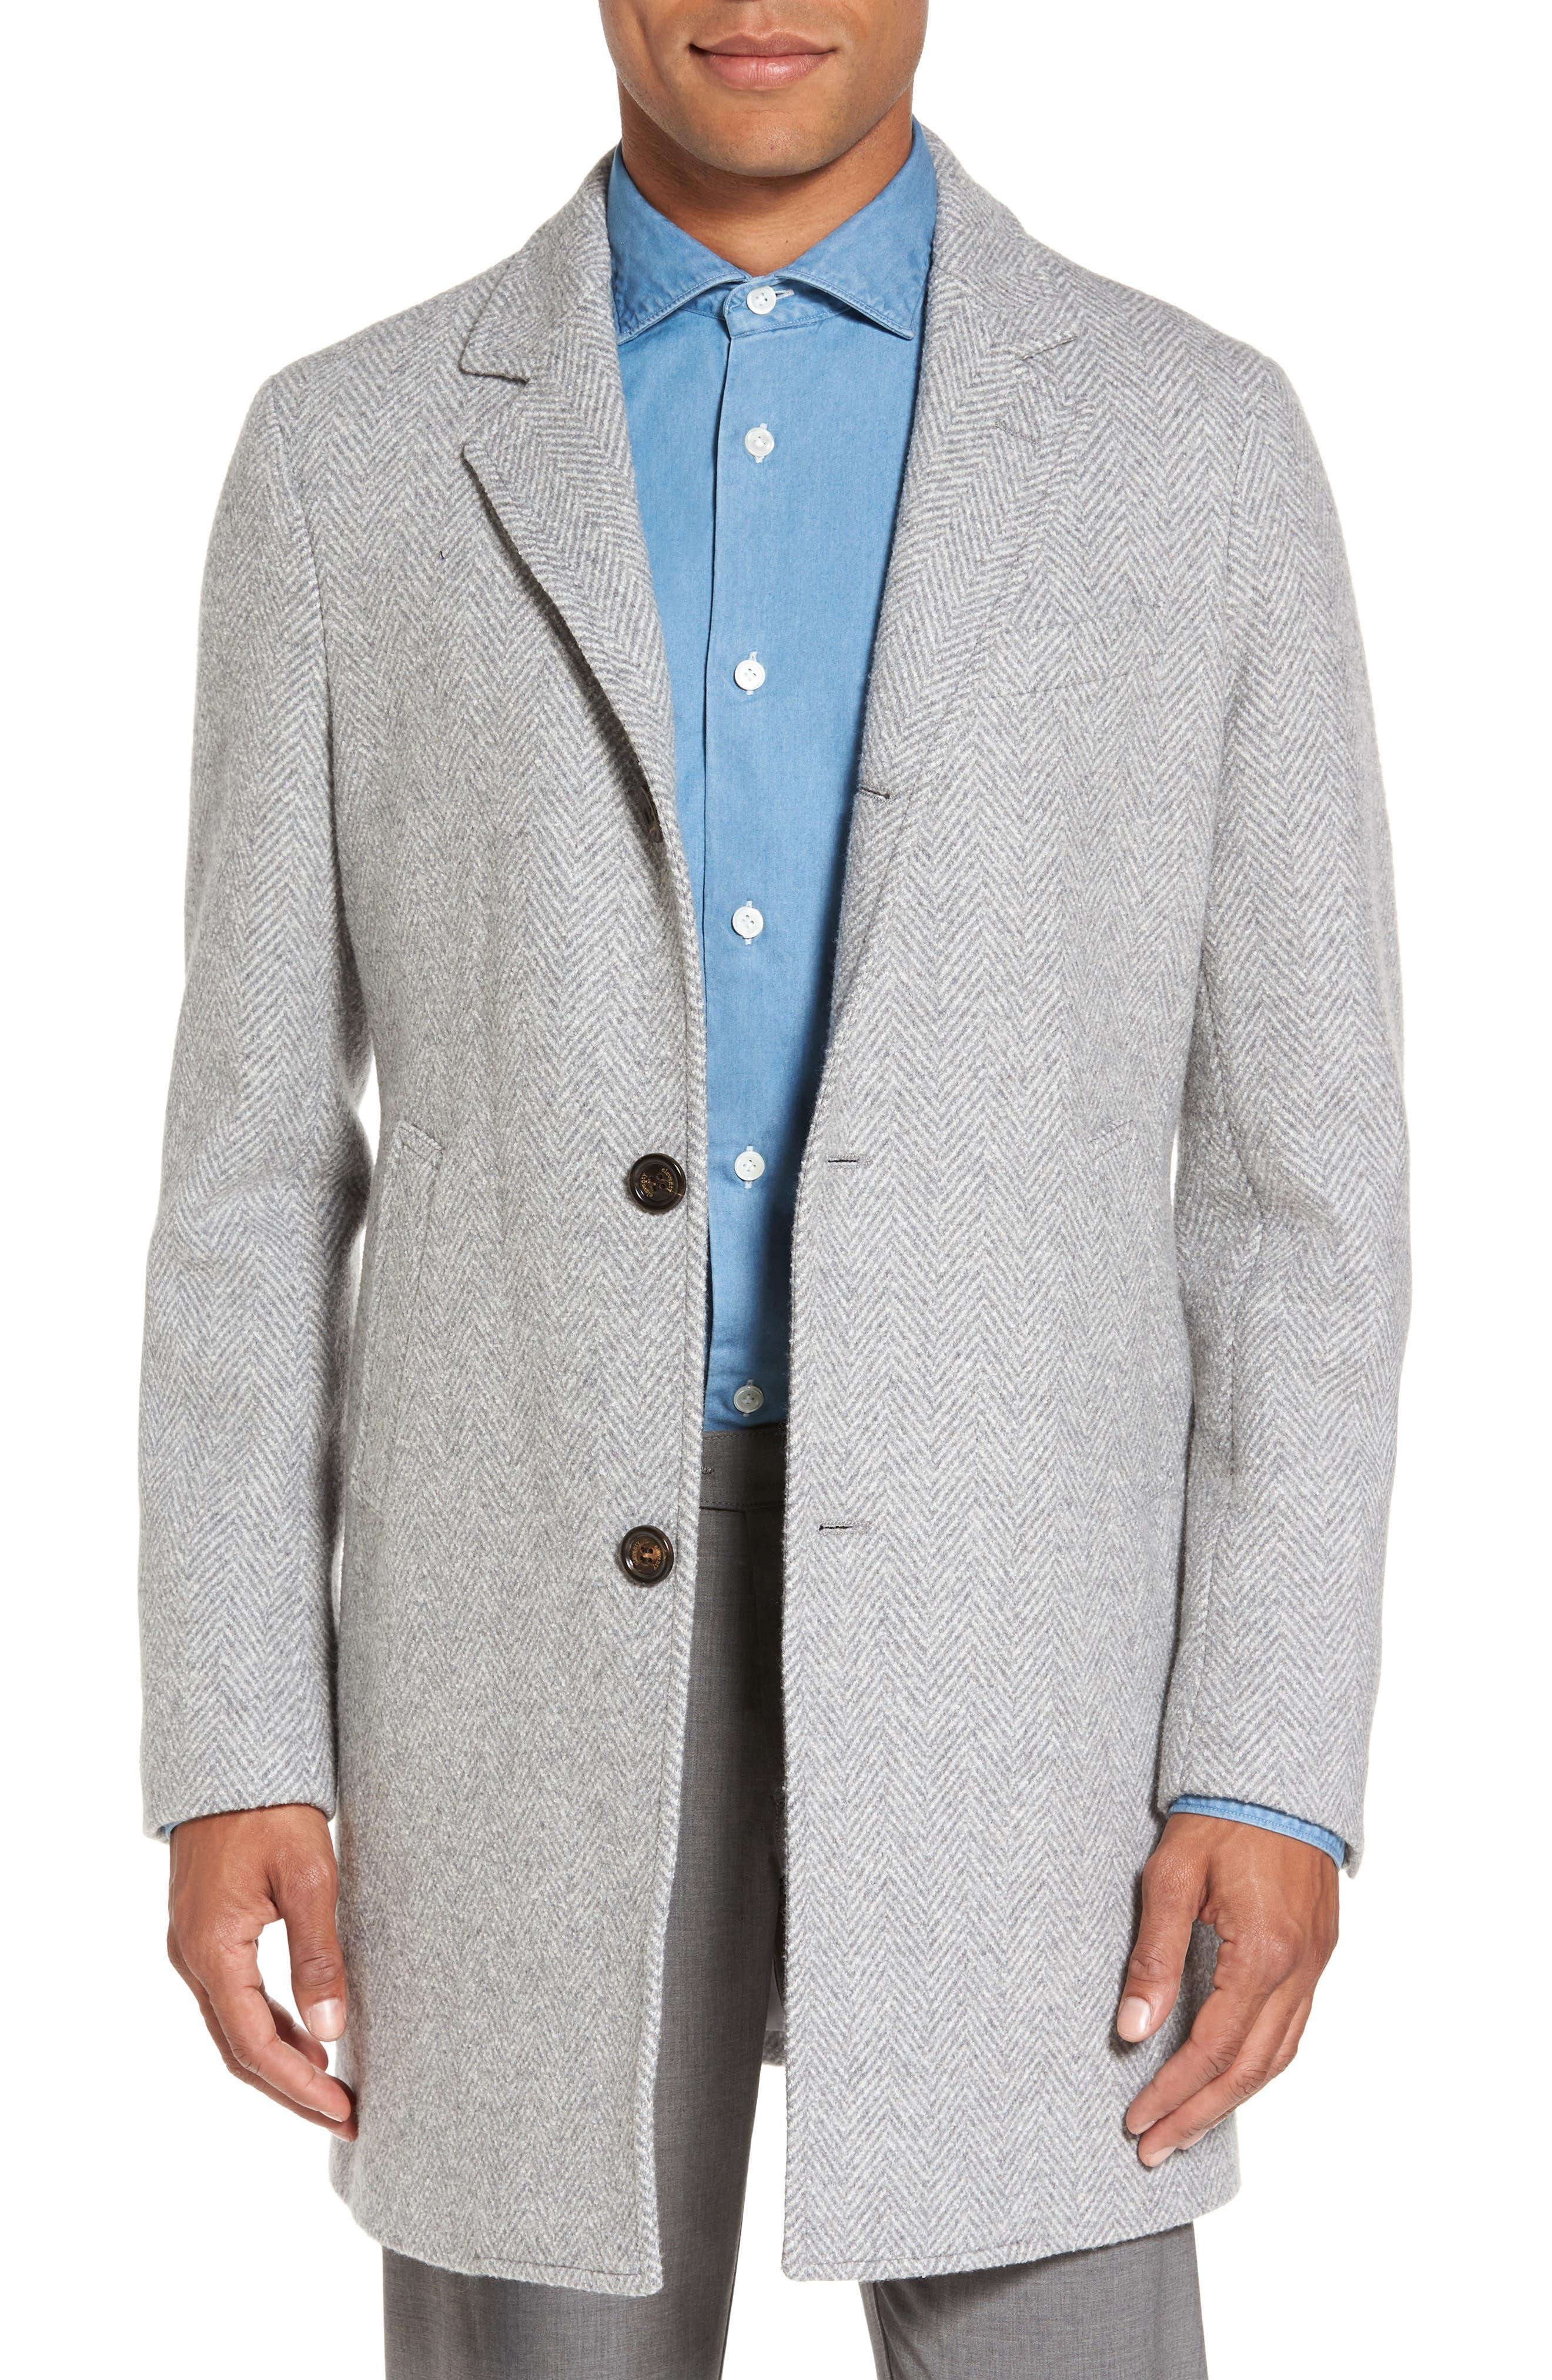 Herringbone Wool Blend Overcoat,                         Main,                         color,